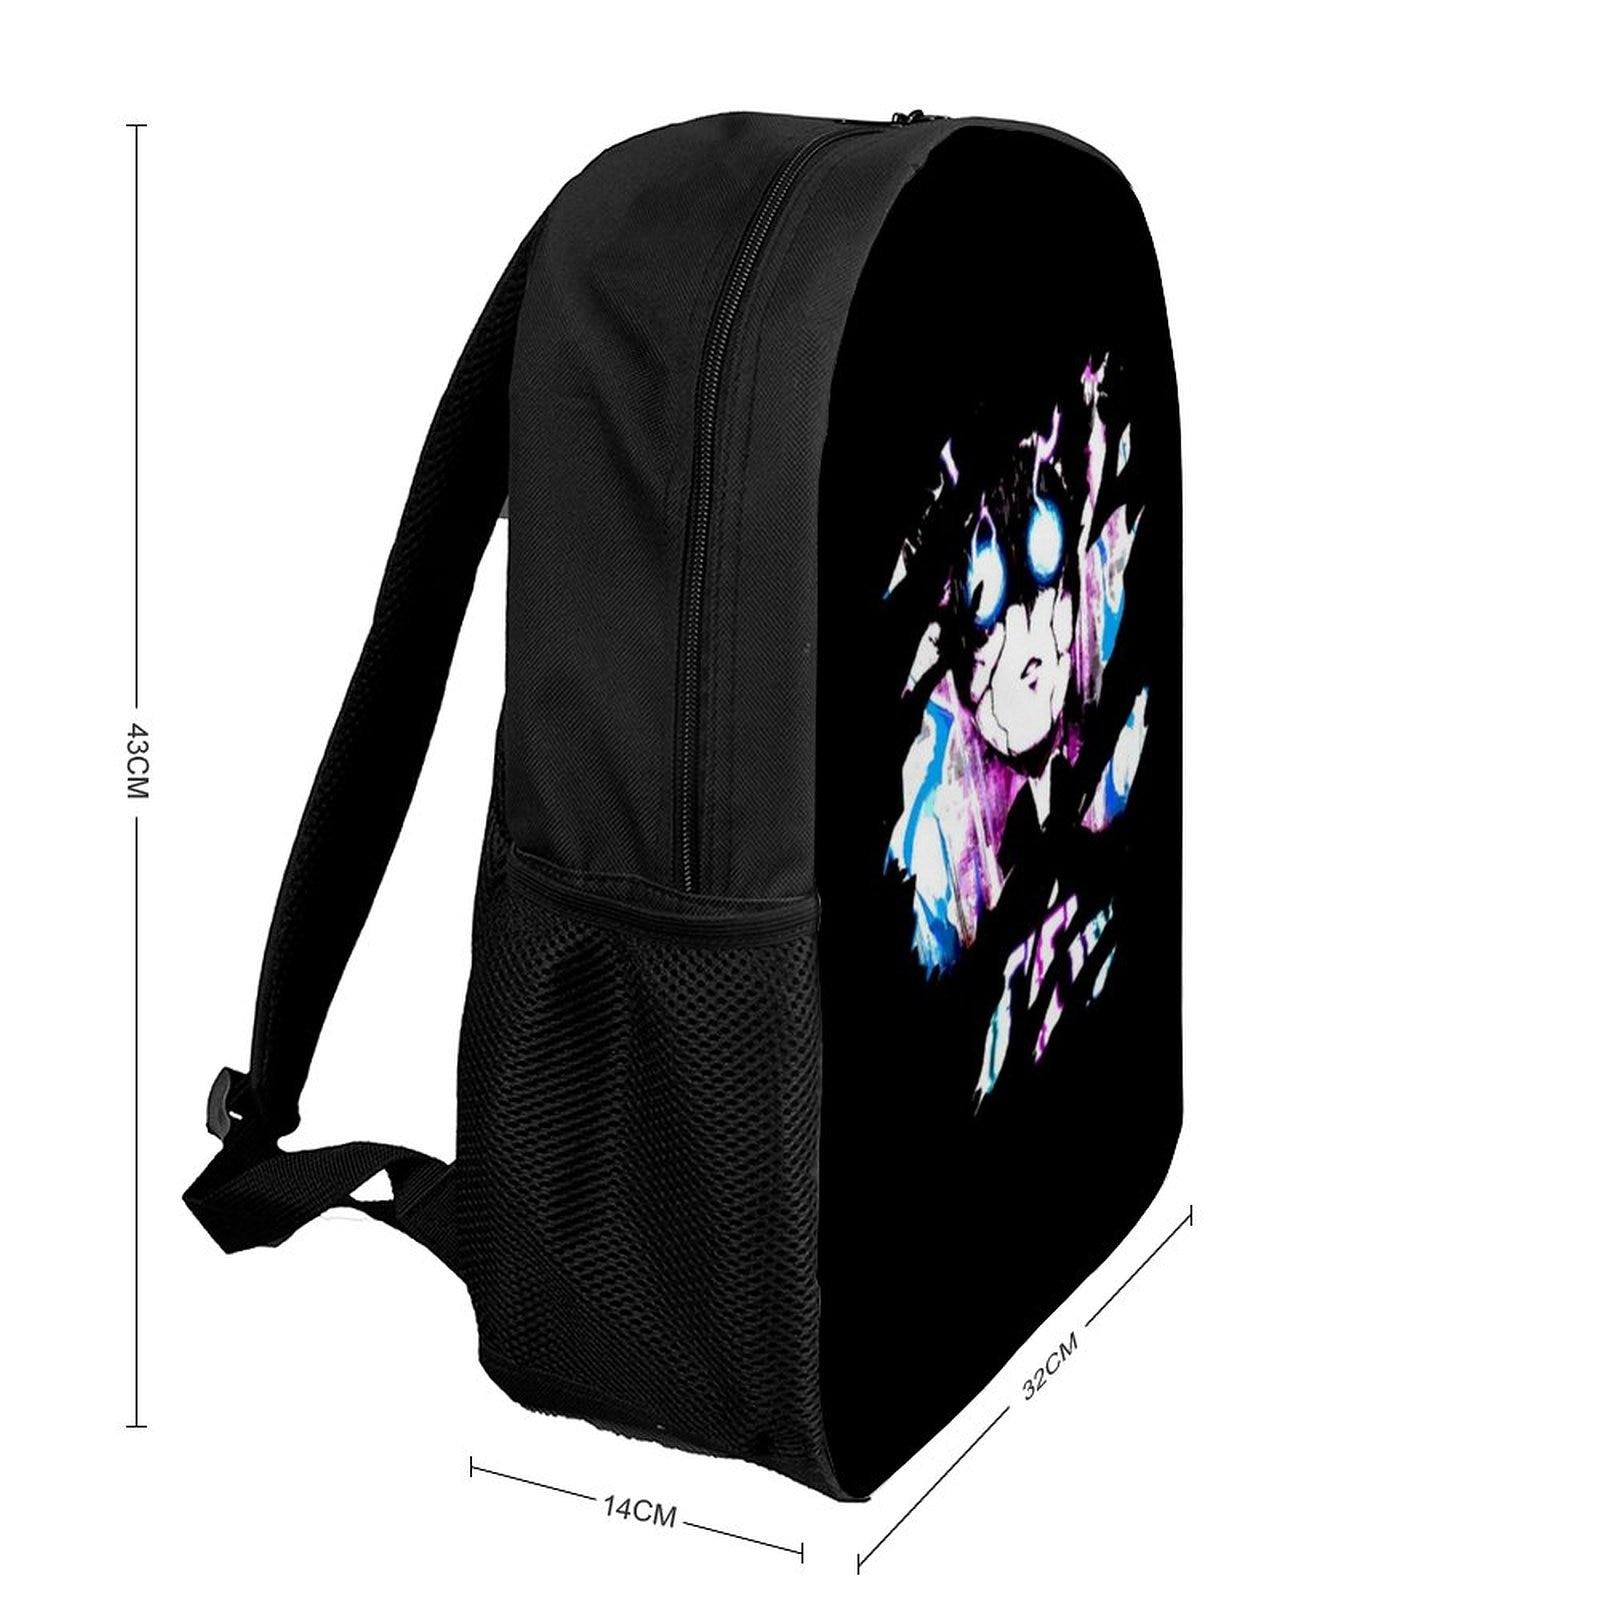 Hfeabc08c5dad493f9033aa51a53b3356z - Anime Backpacks